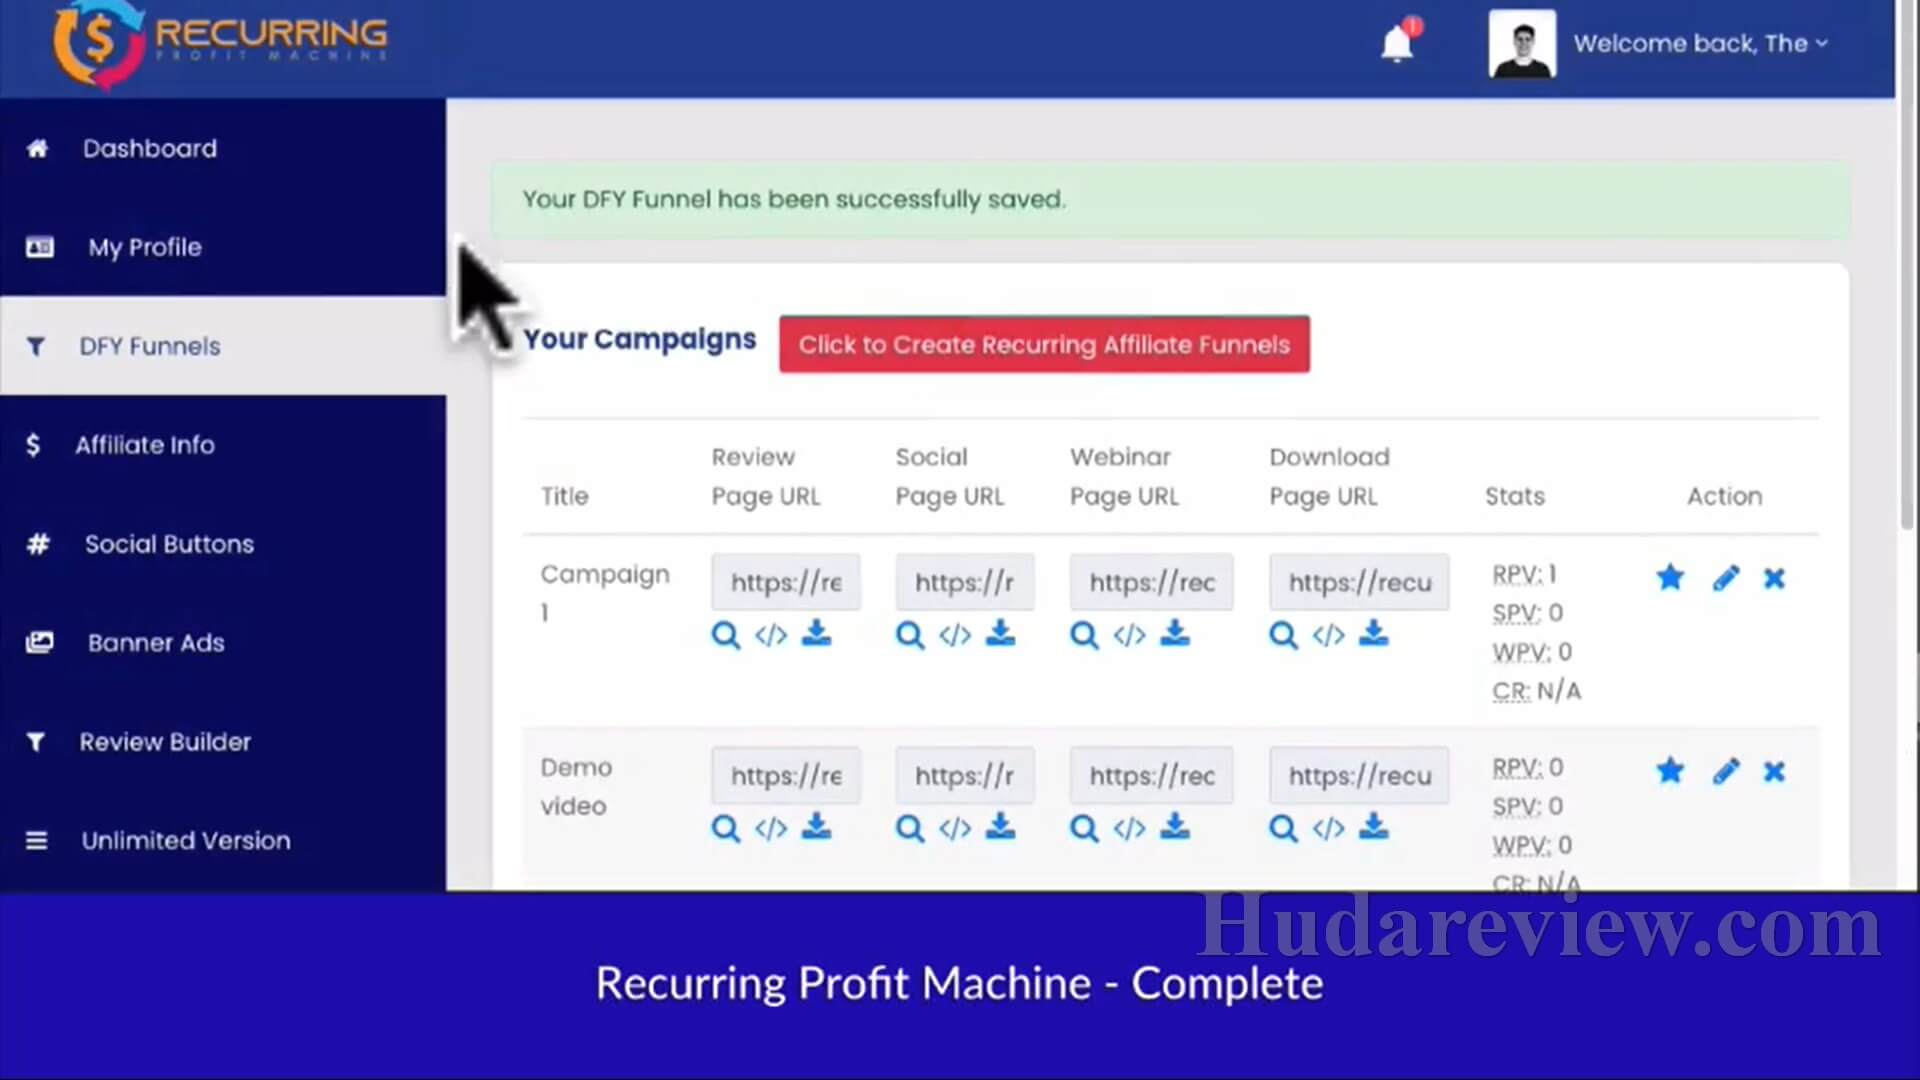 Recurring-Profit-Machine-Review-5-7